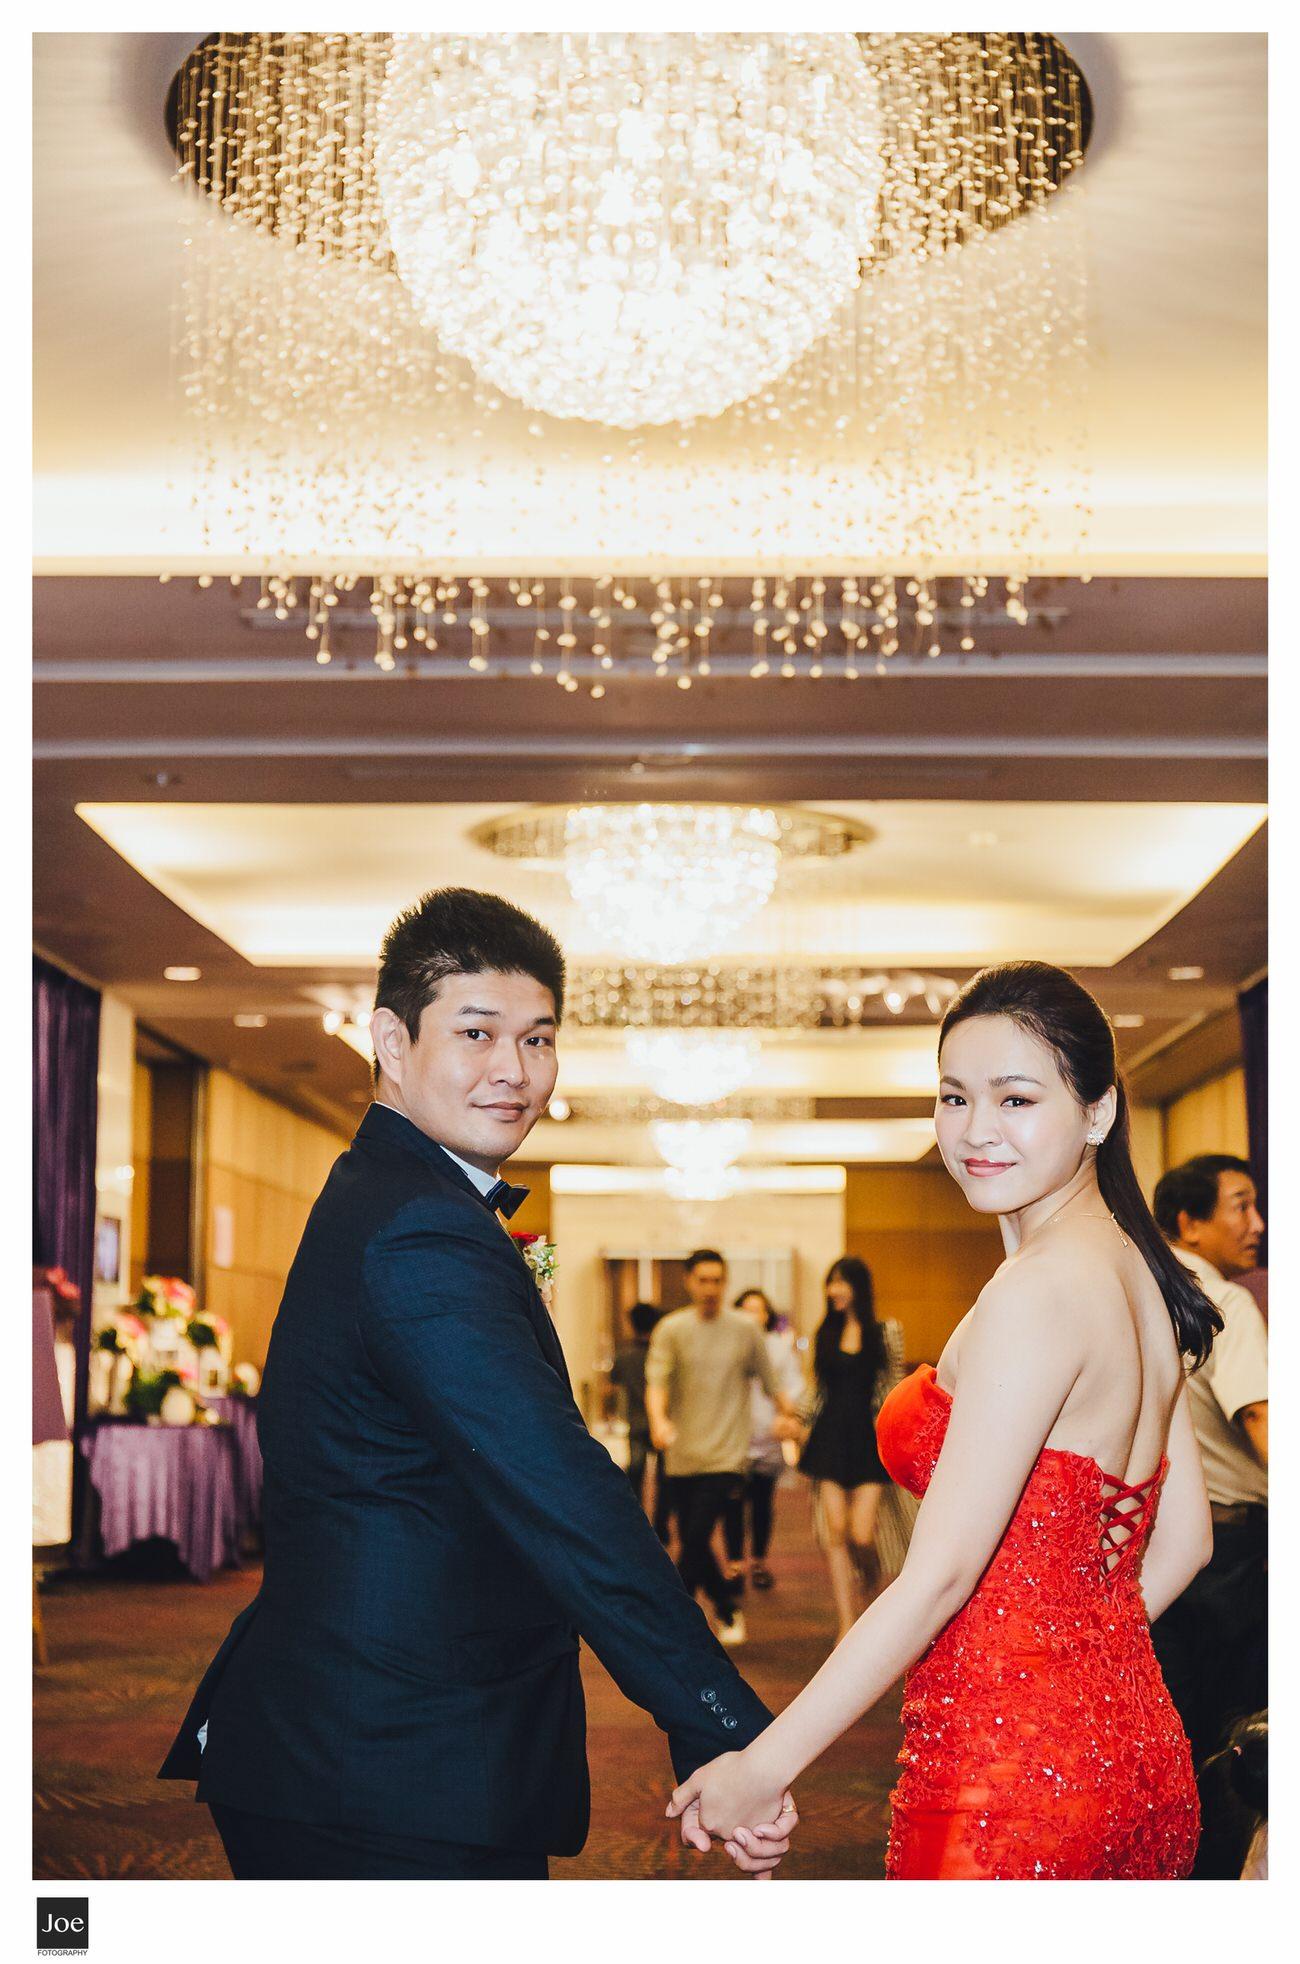 grand-hilai-hotel-wedding-daniel-yvette-joe-fotography-140.jpg